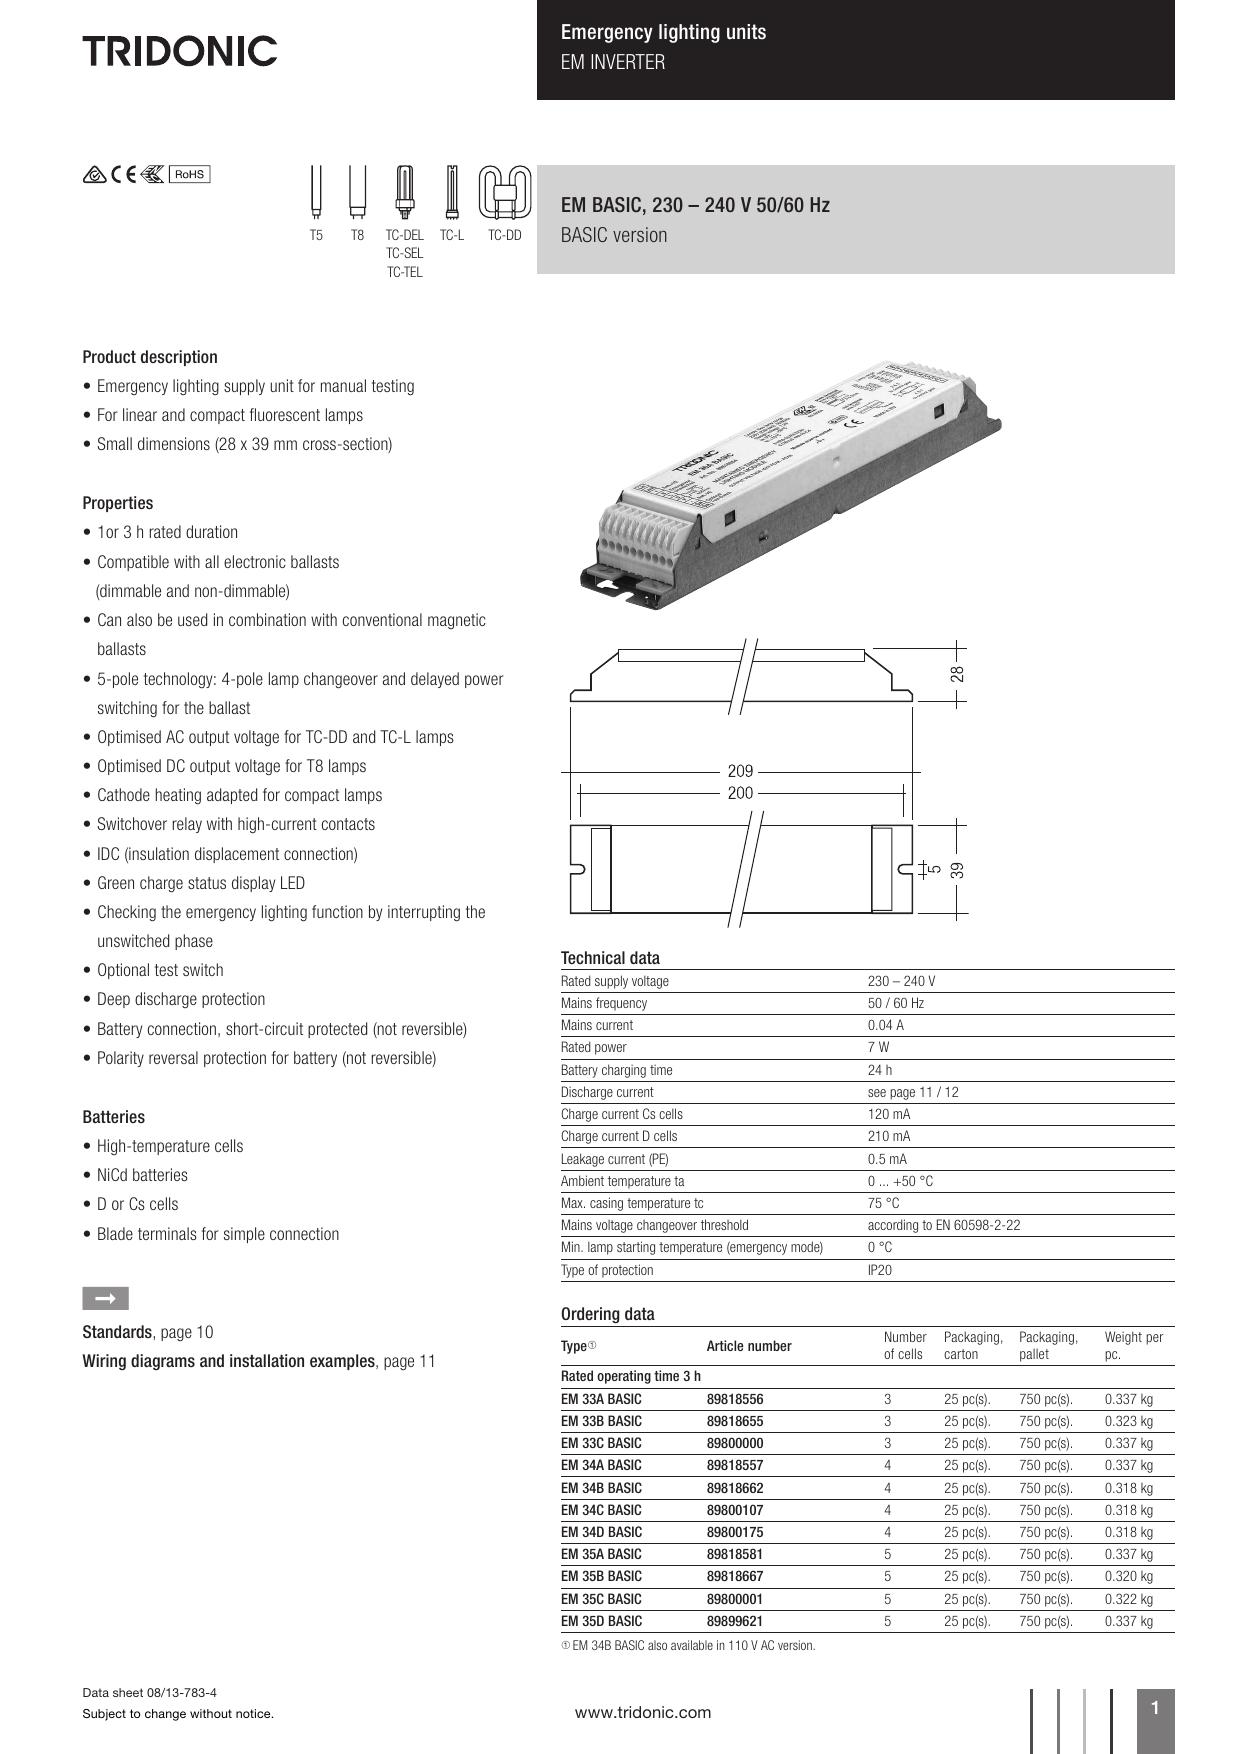 018775435_1 2dcf560db24312930ad8291746b02024 emergency lighting units em inverter em basic, 230 tridonic em34b basic wiring diagram at honlapkeszites.co